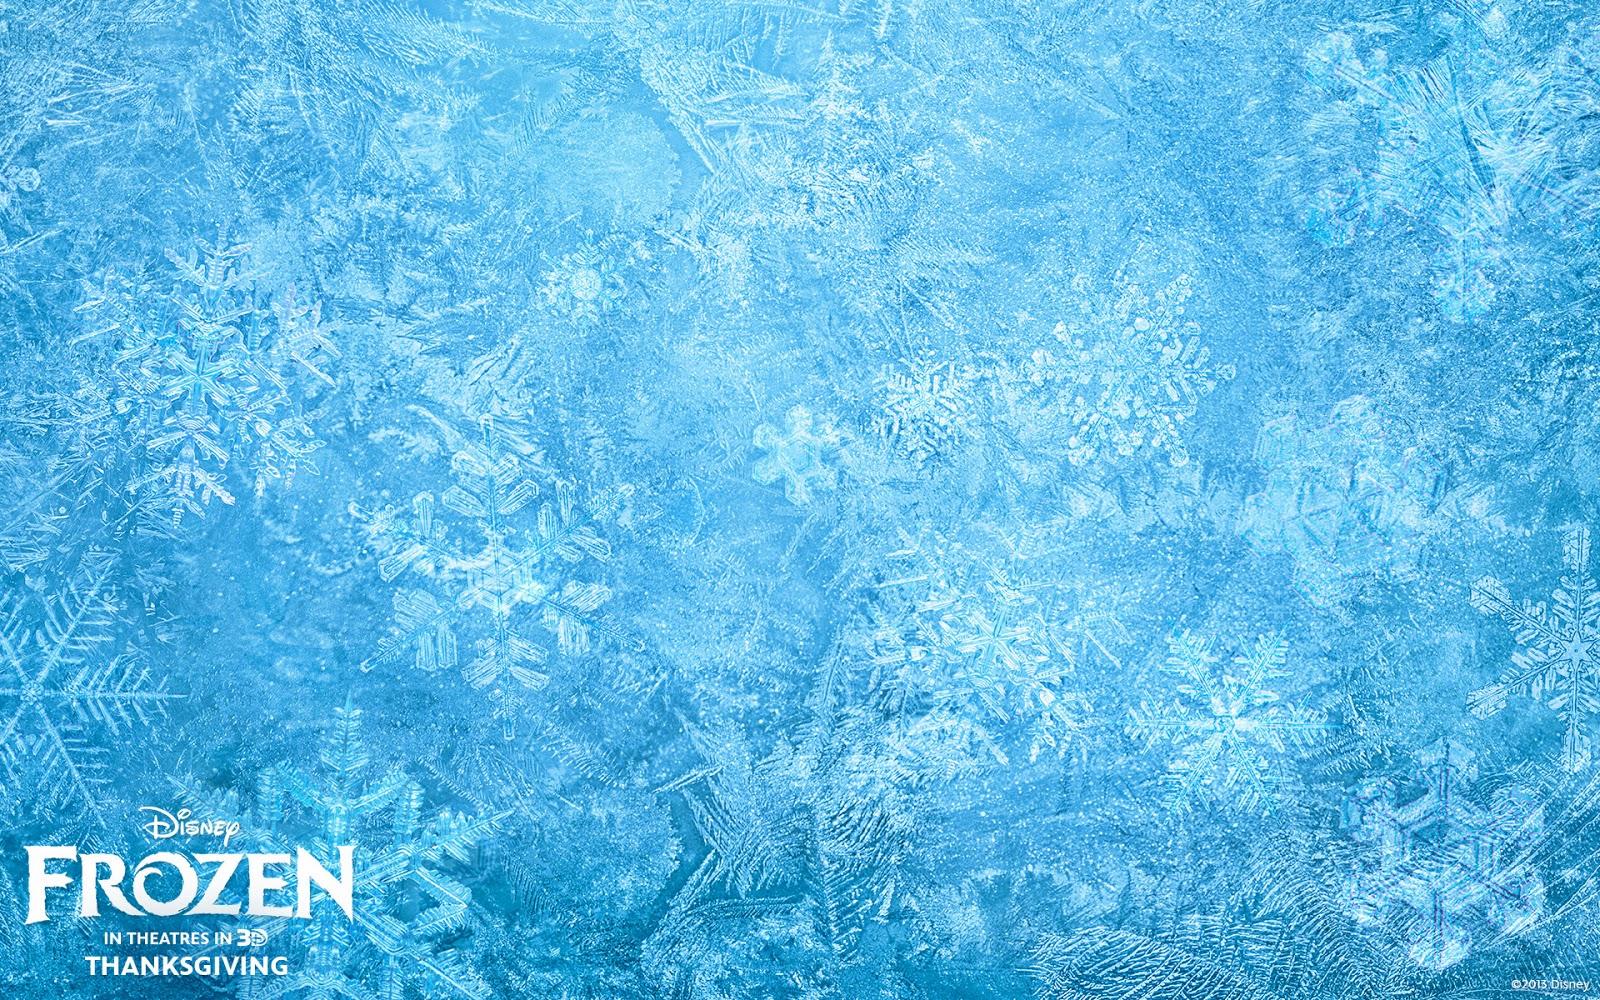 Disney Frozen Ice Texture